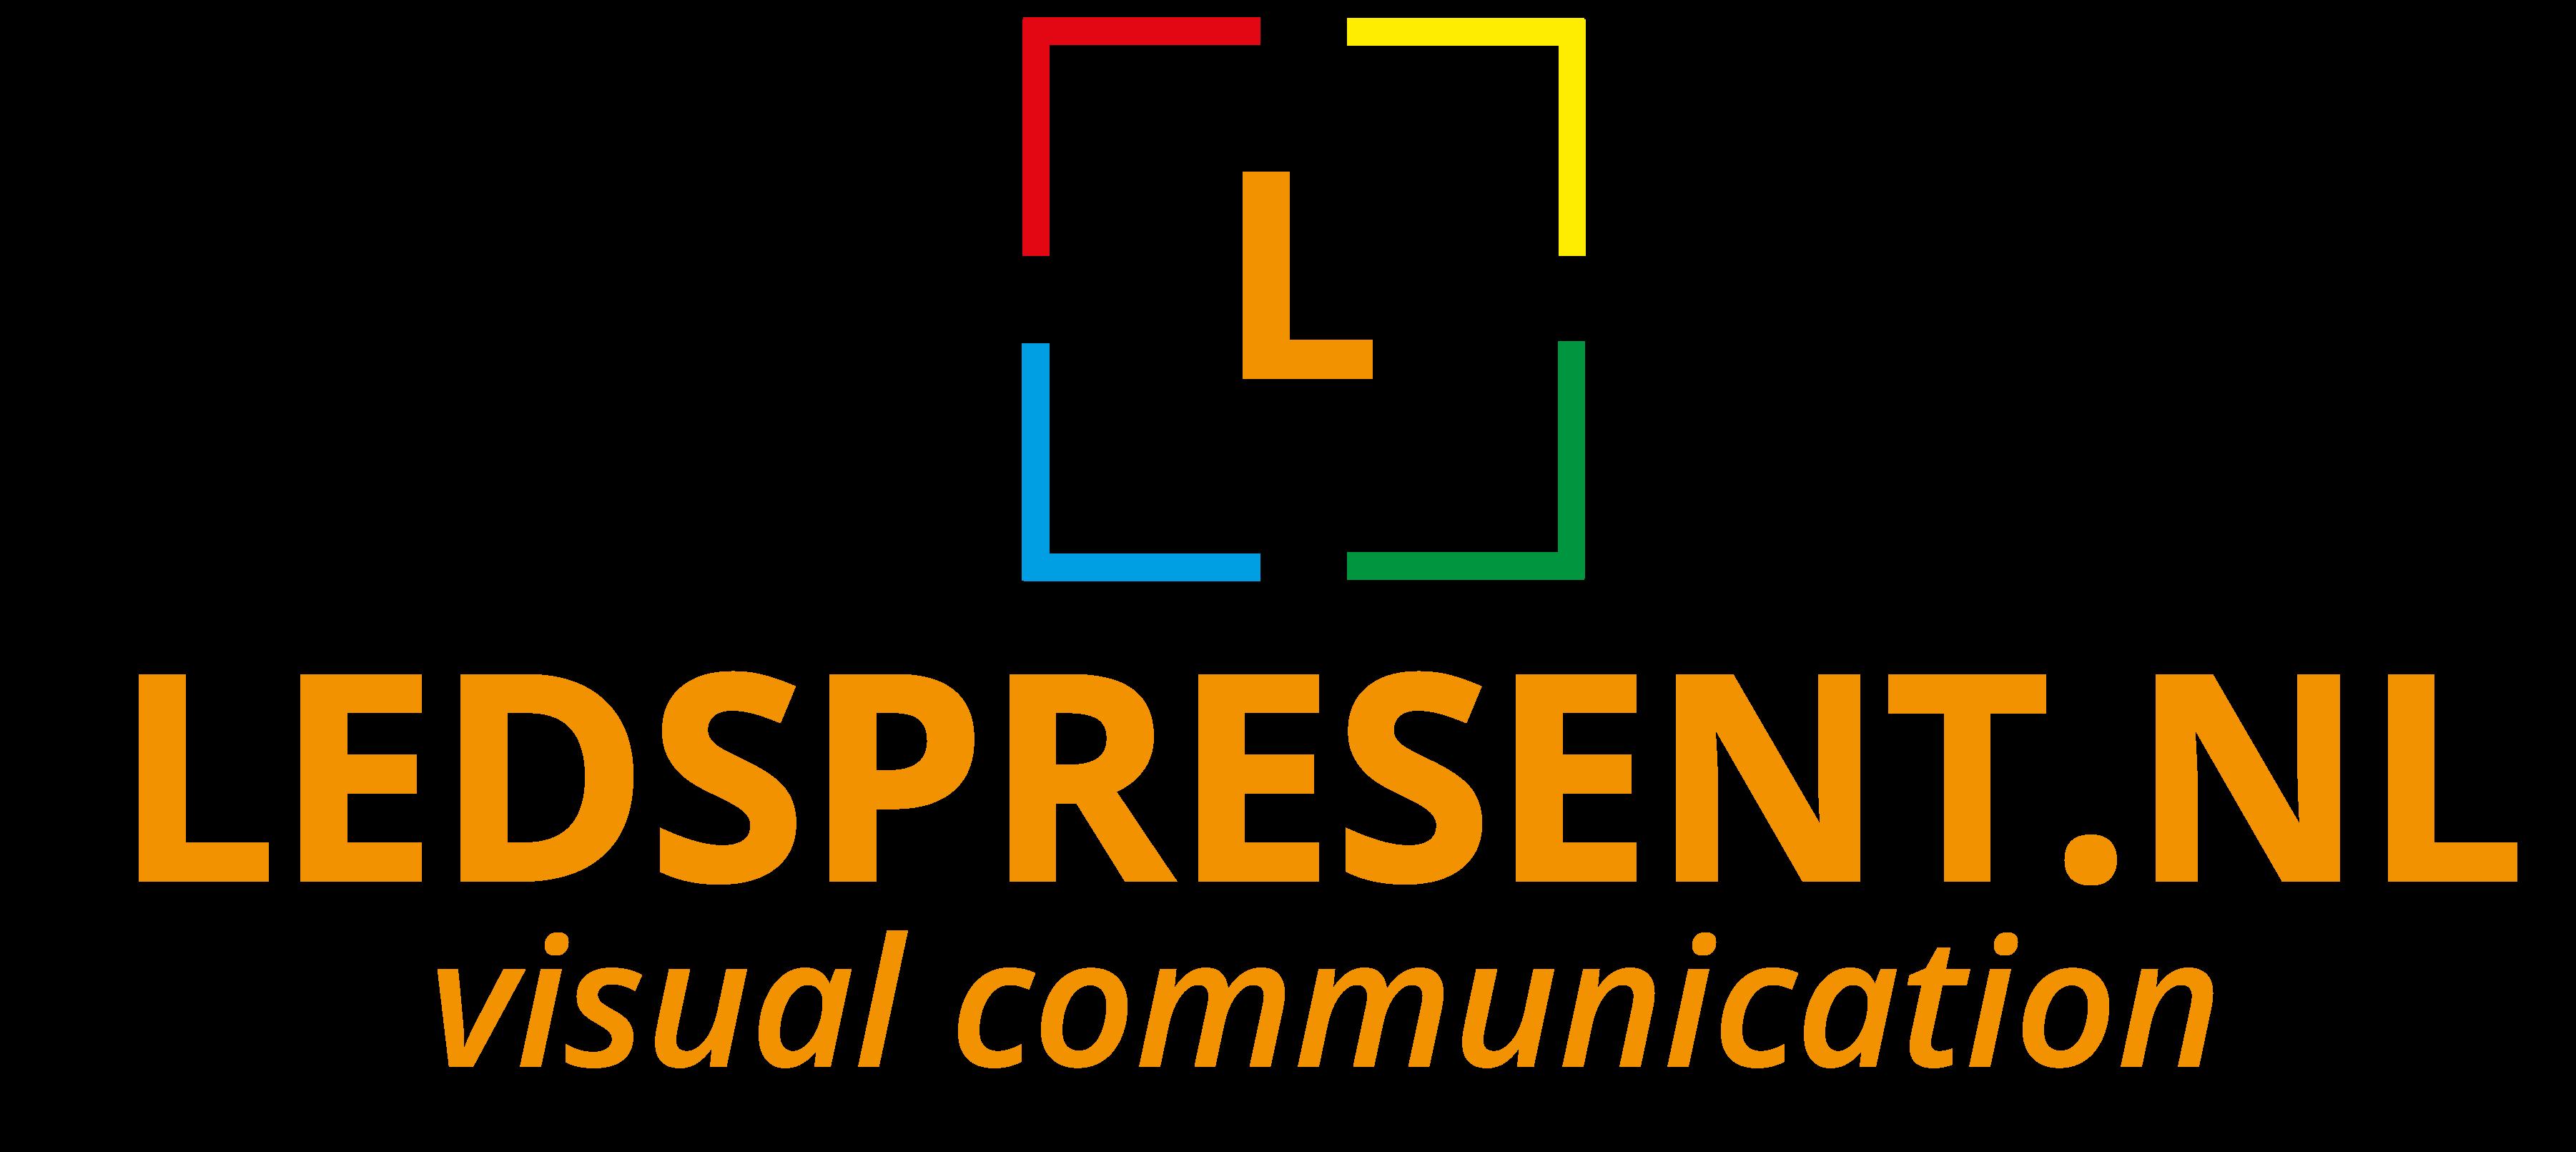 Ledspresent.nl